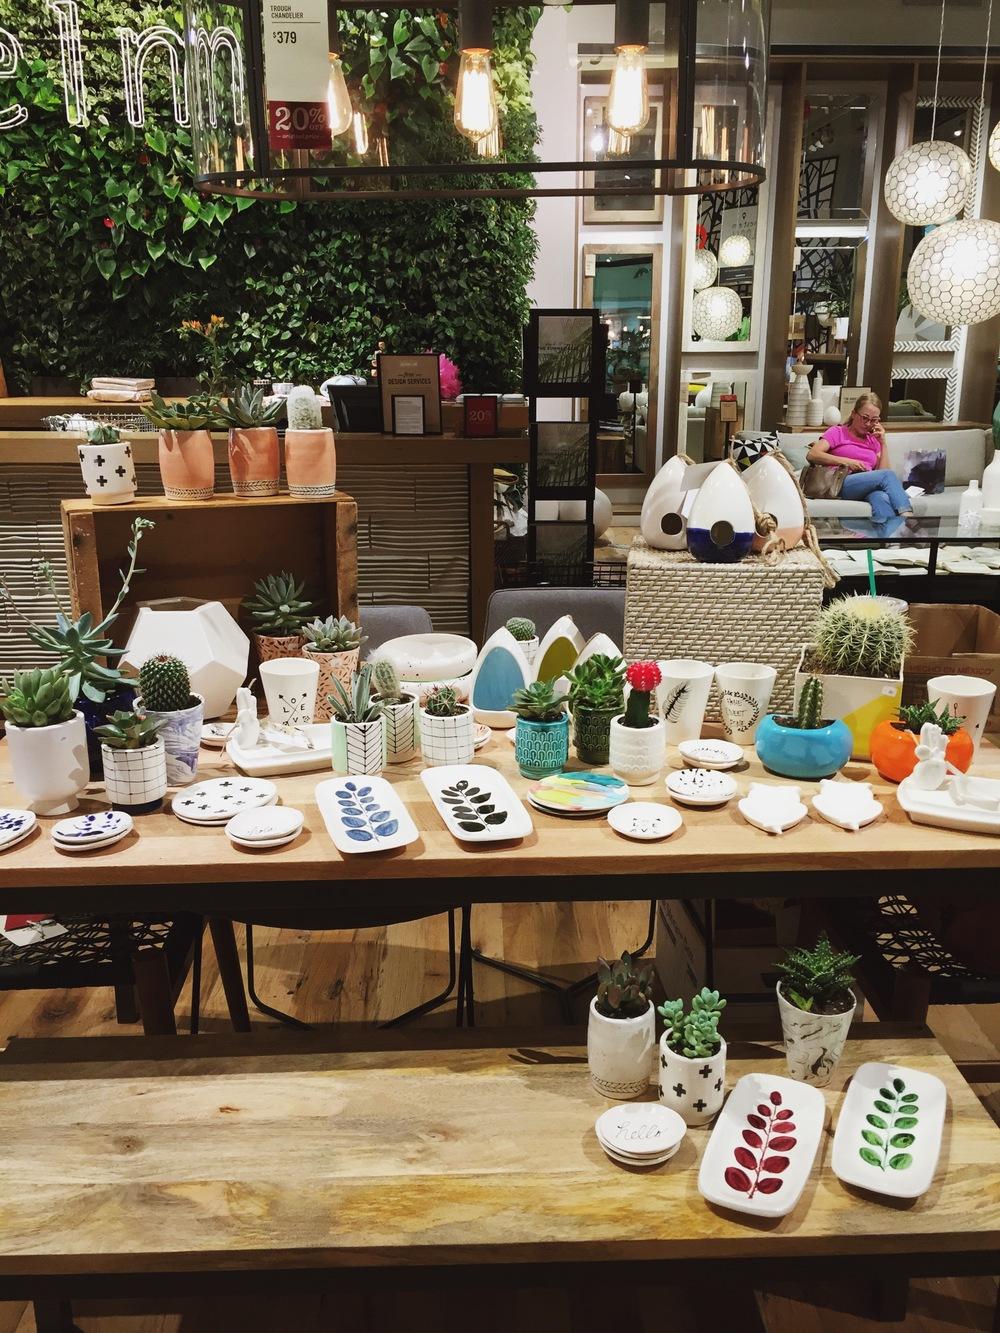 West Elm Pop Up Andrea Luna Reece Art Ceramics - West elm pop up table